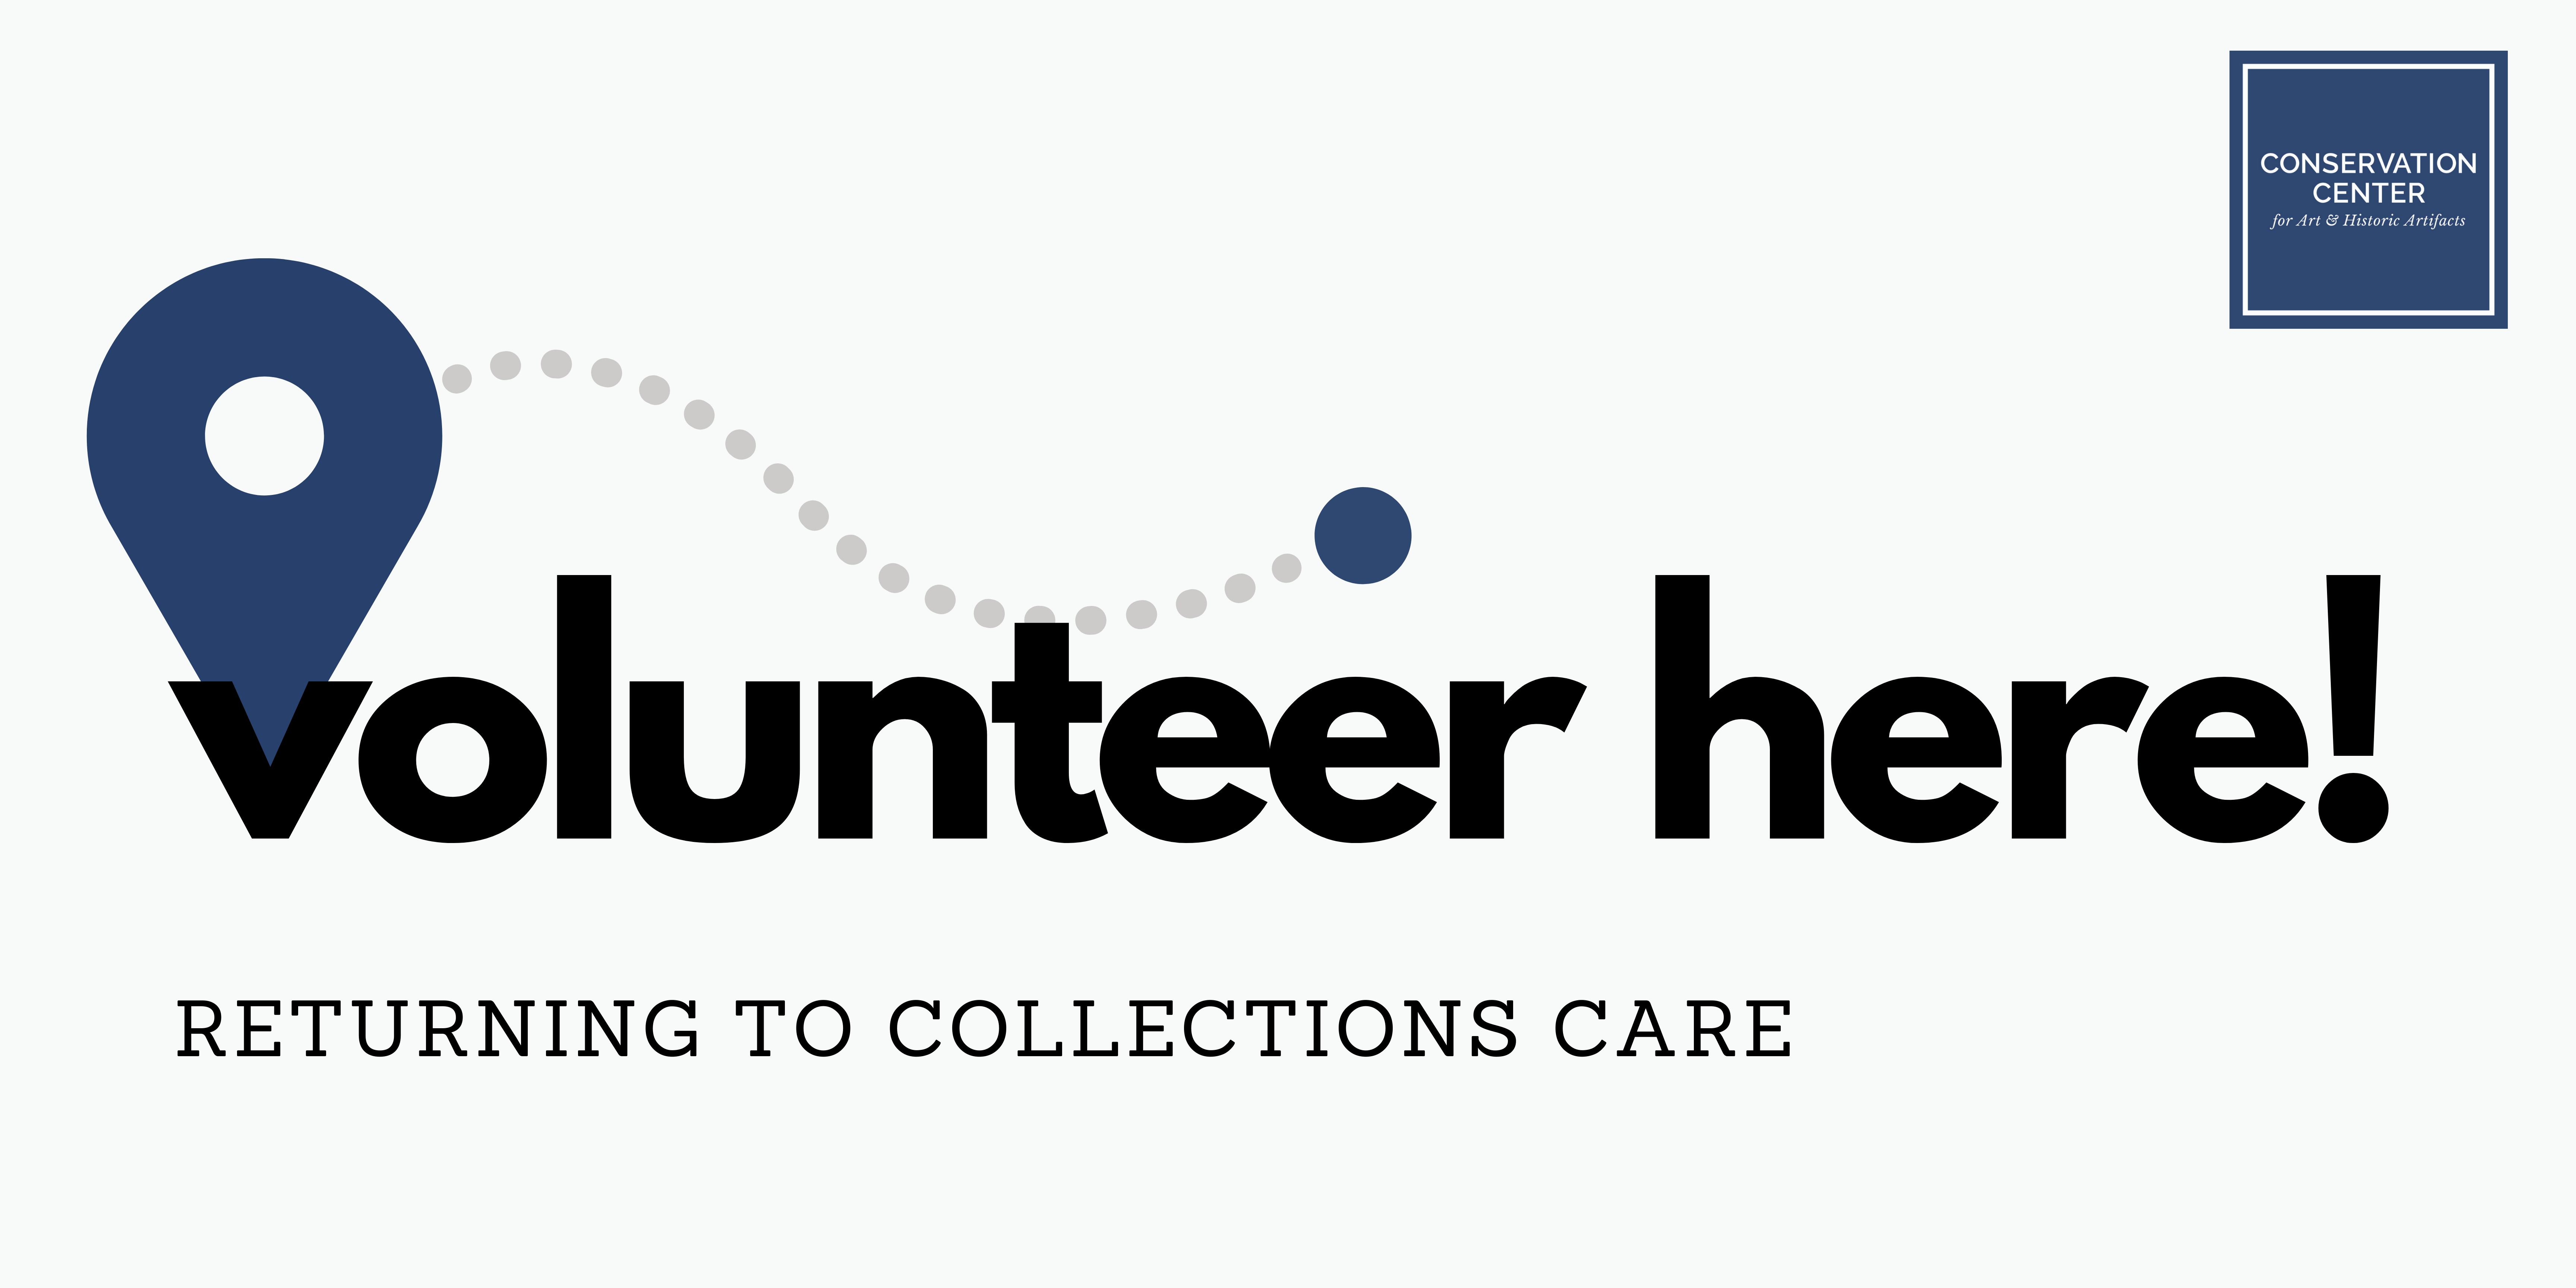 https://ccaha.org/sites/default/files/2021-08/volunteer%20here%21.png